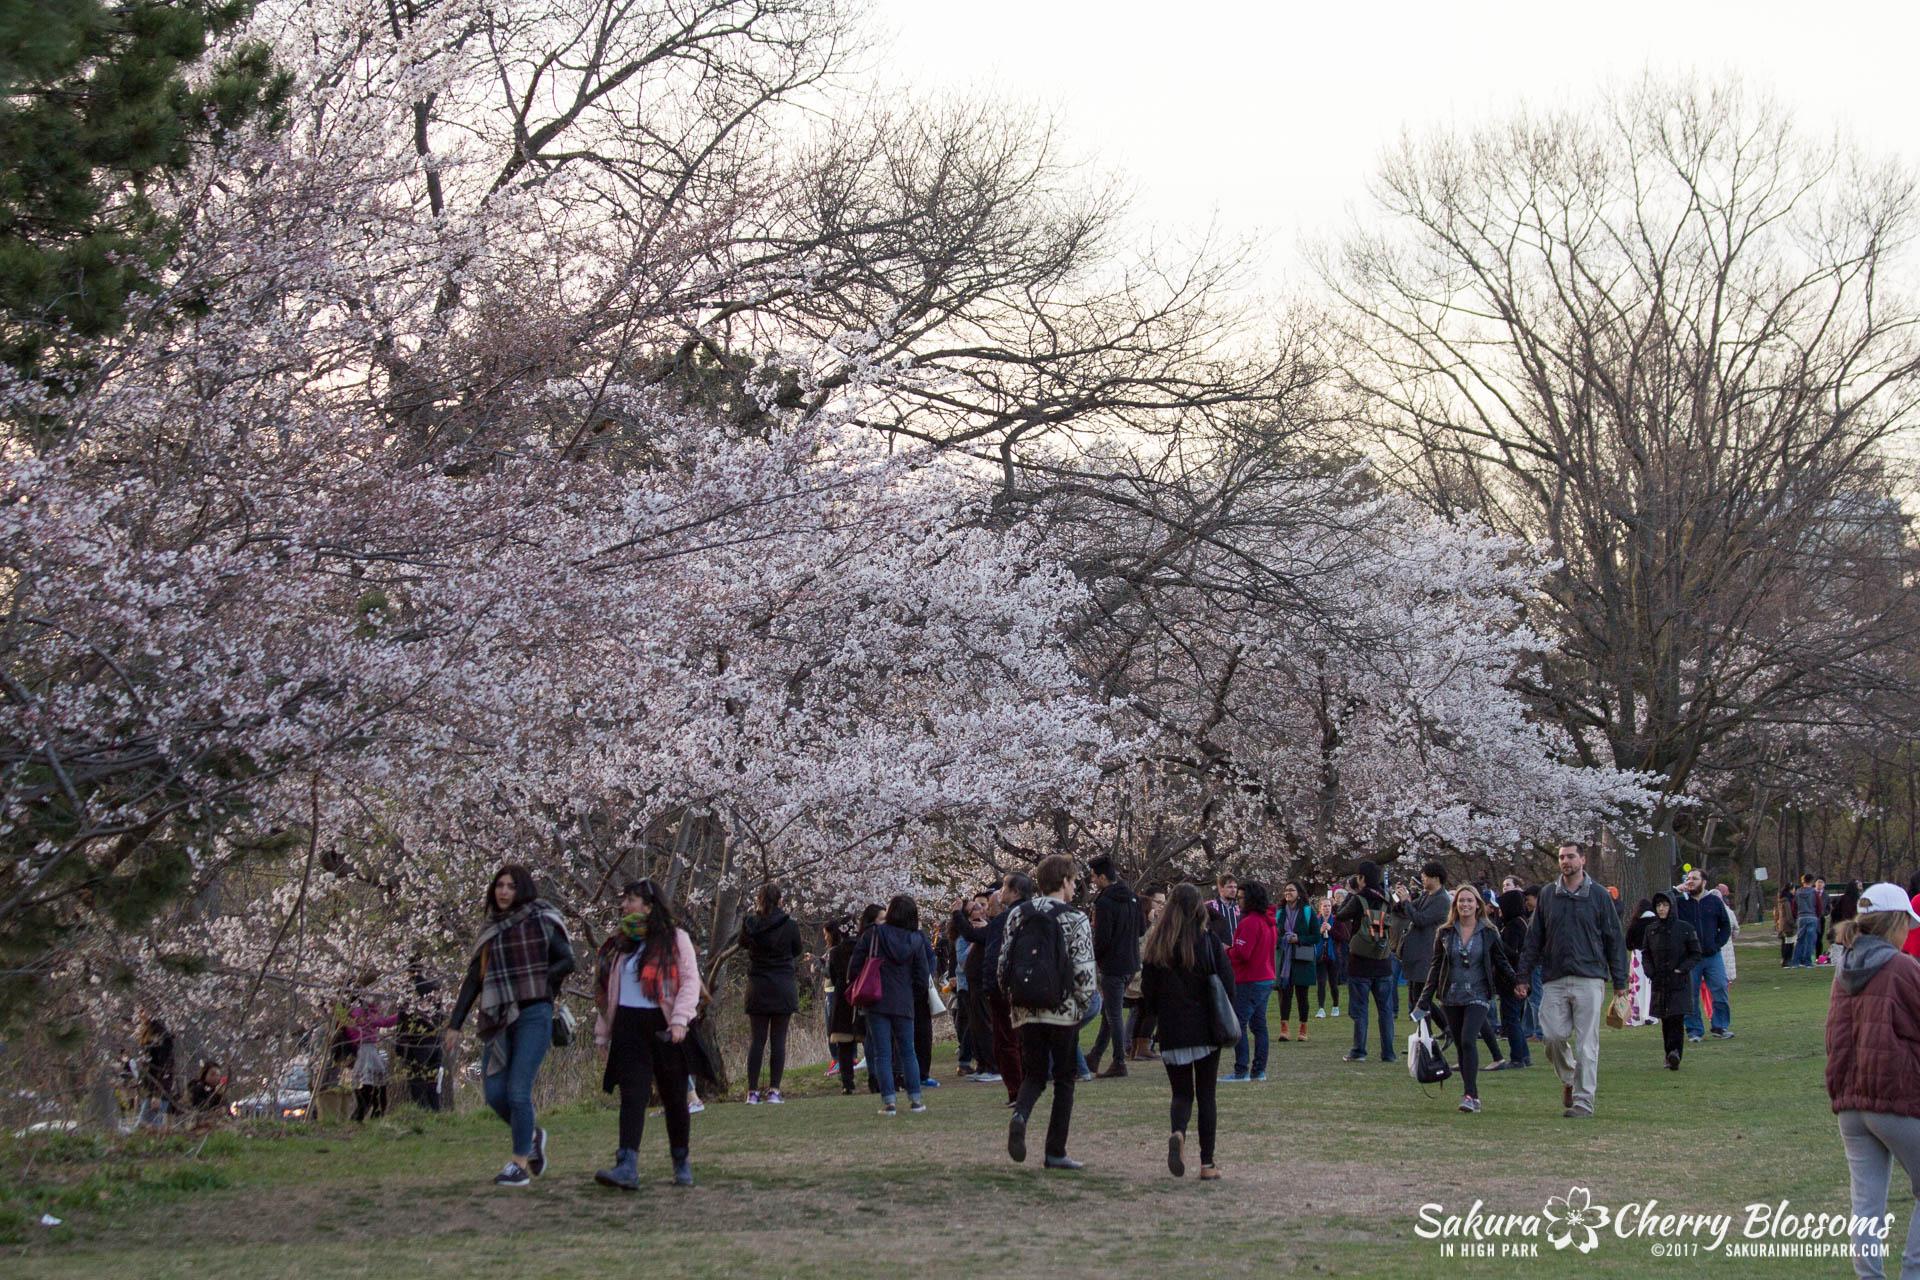 Sakura-Watch-April-24-2017-bloom-has-begun-with-more-to-come-187.jpg